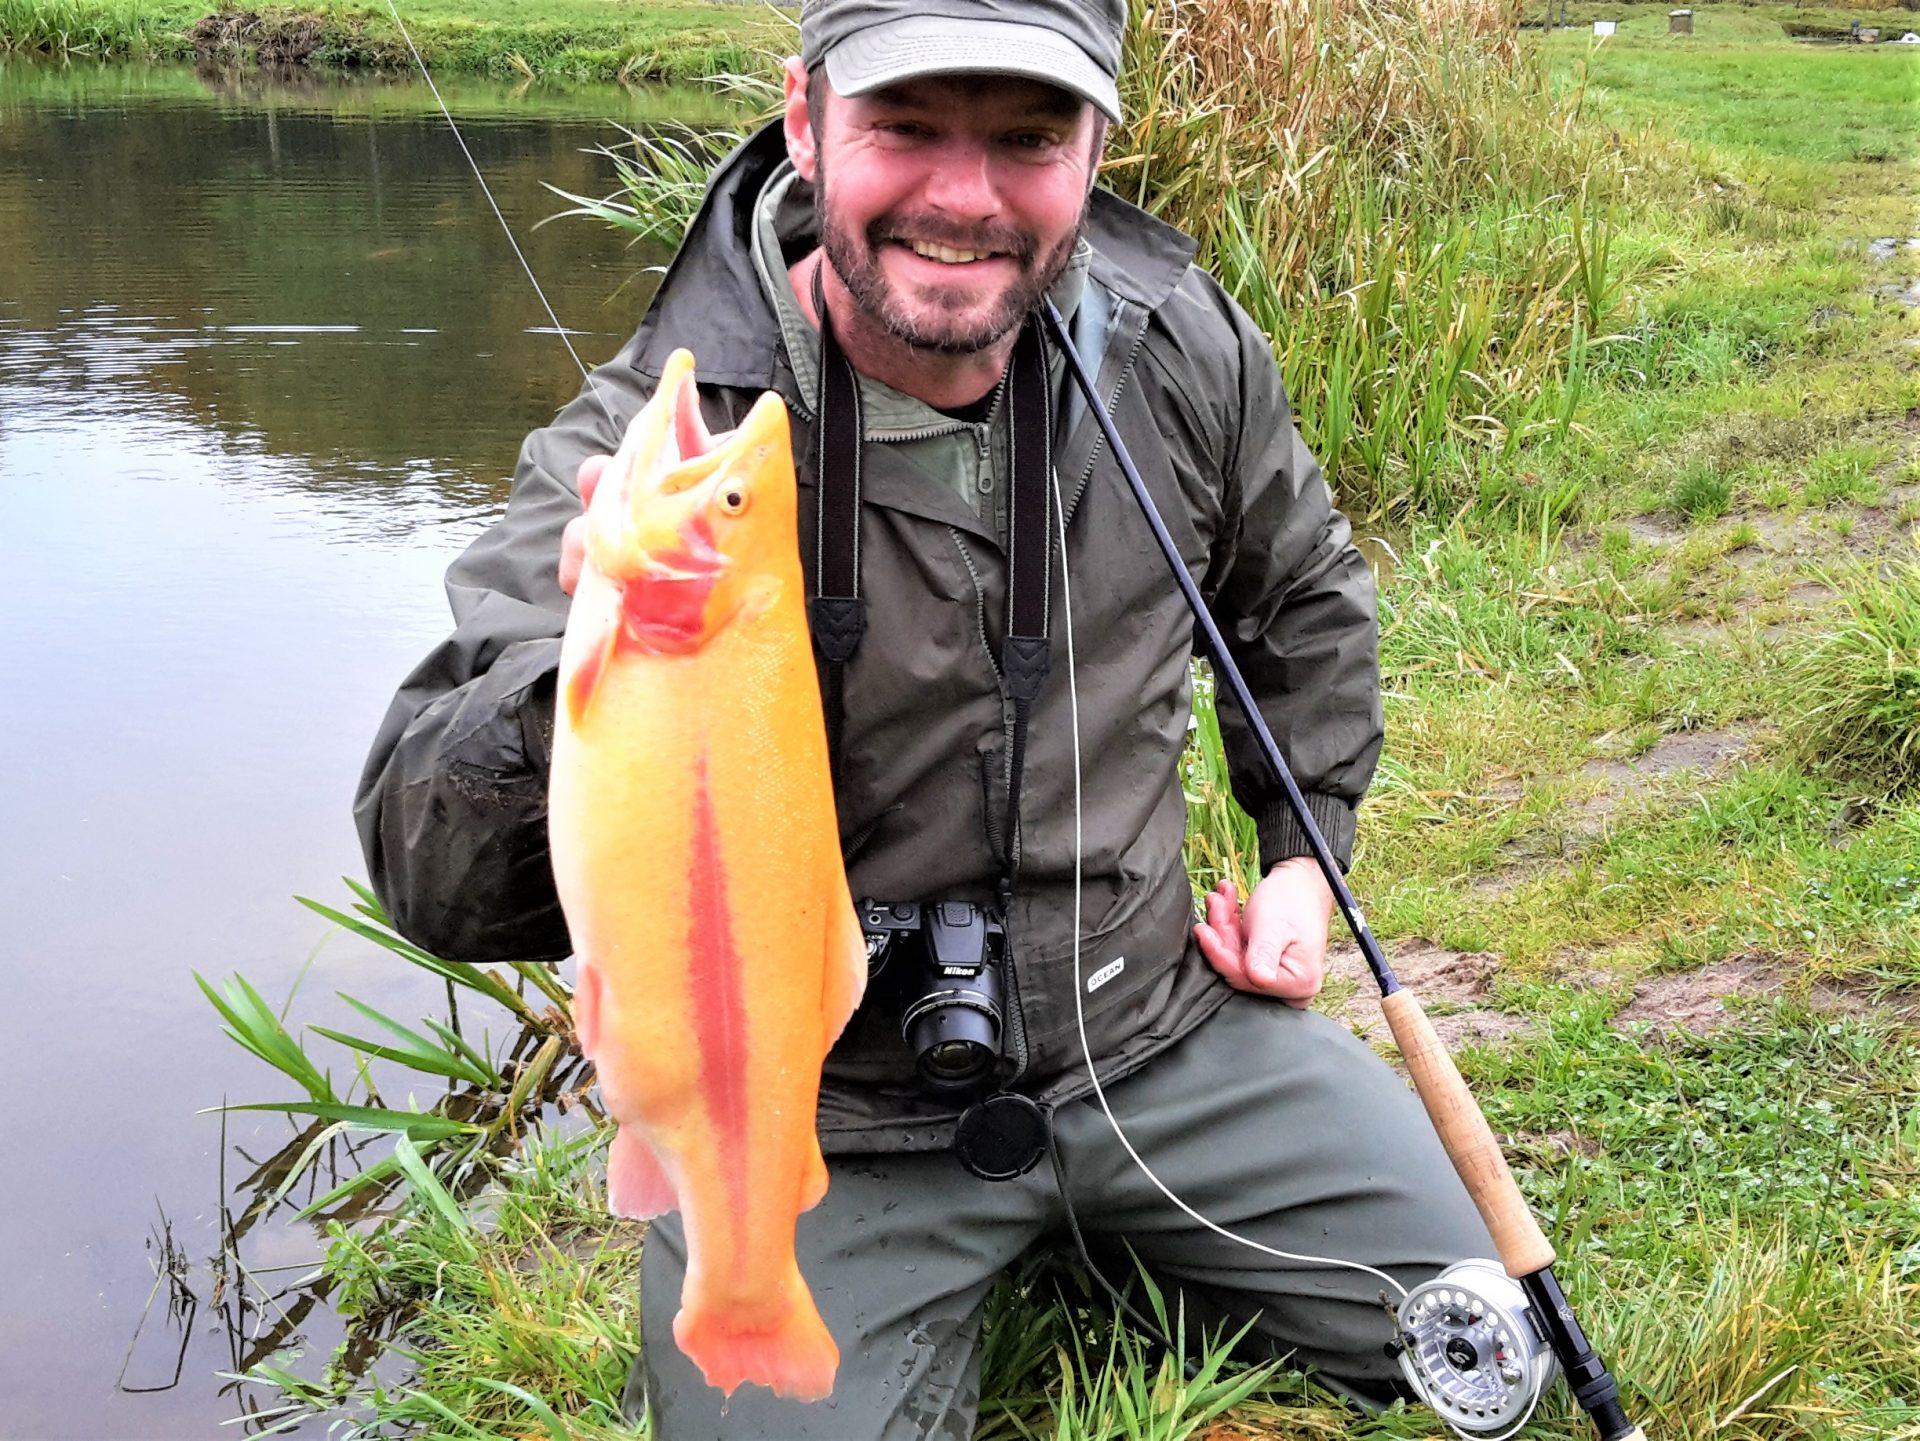 Fluefiskeri i put and takesøerne